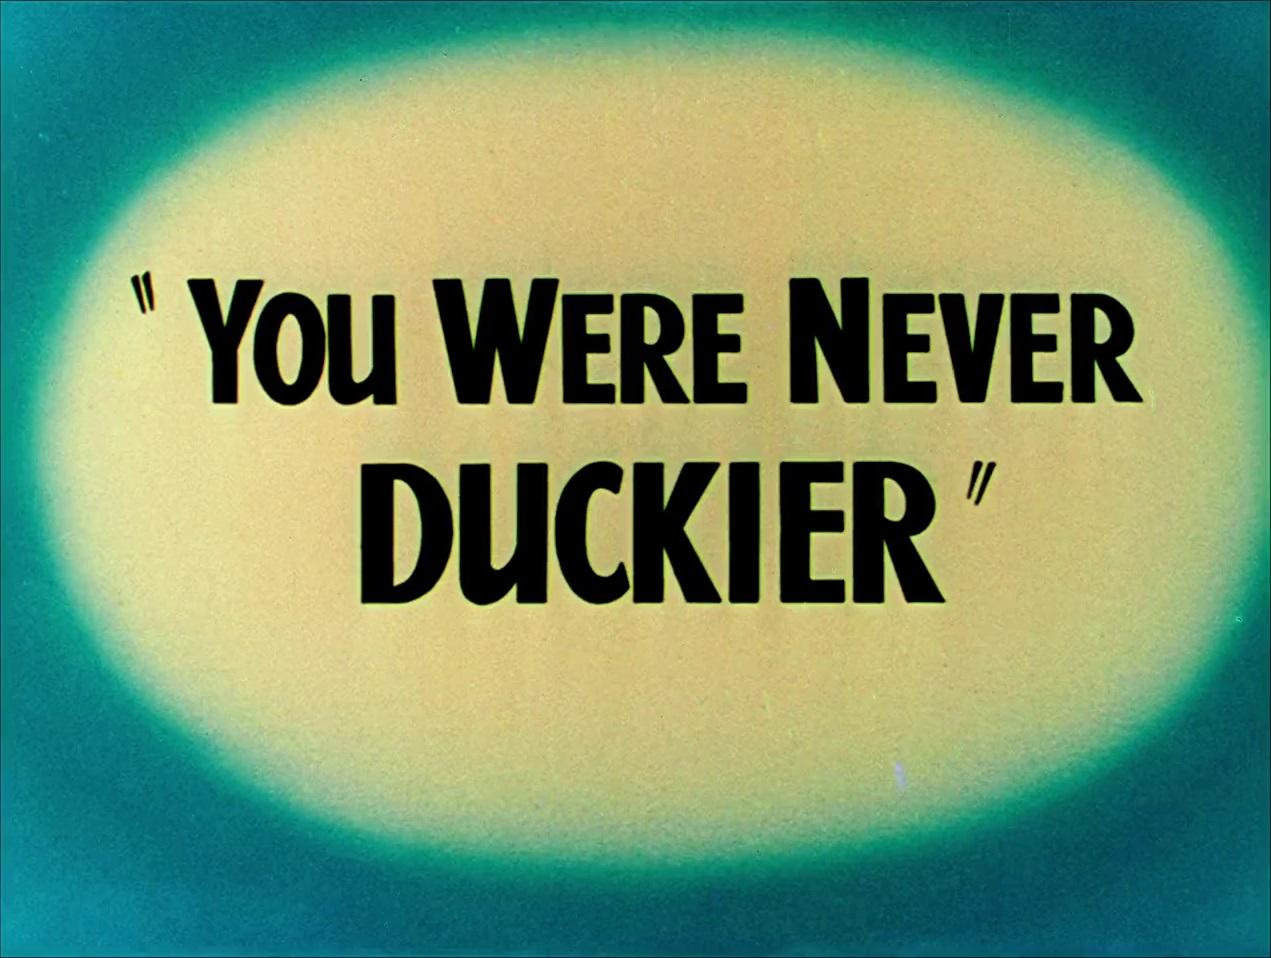 File:You Were Never Duckier.jpg